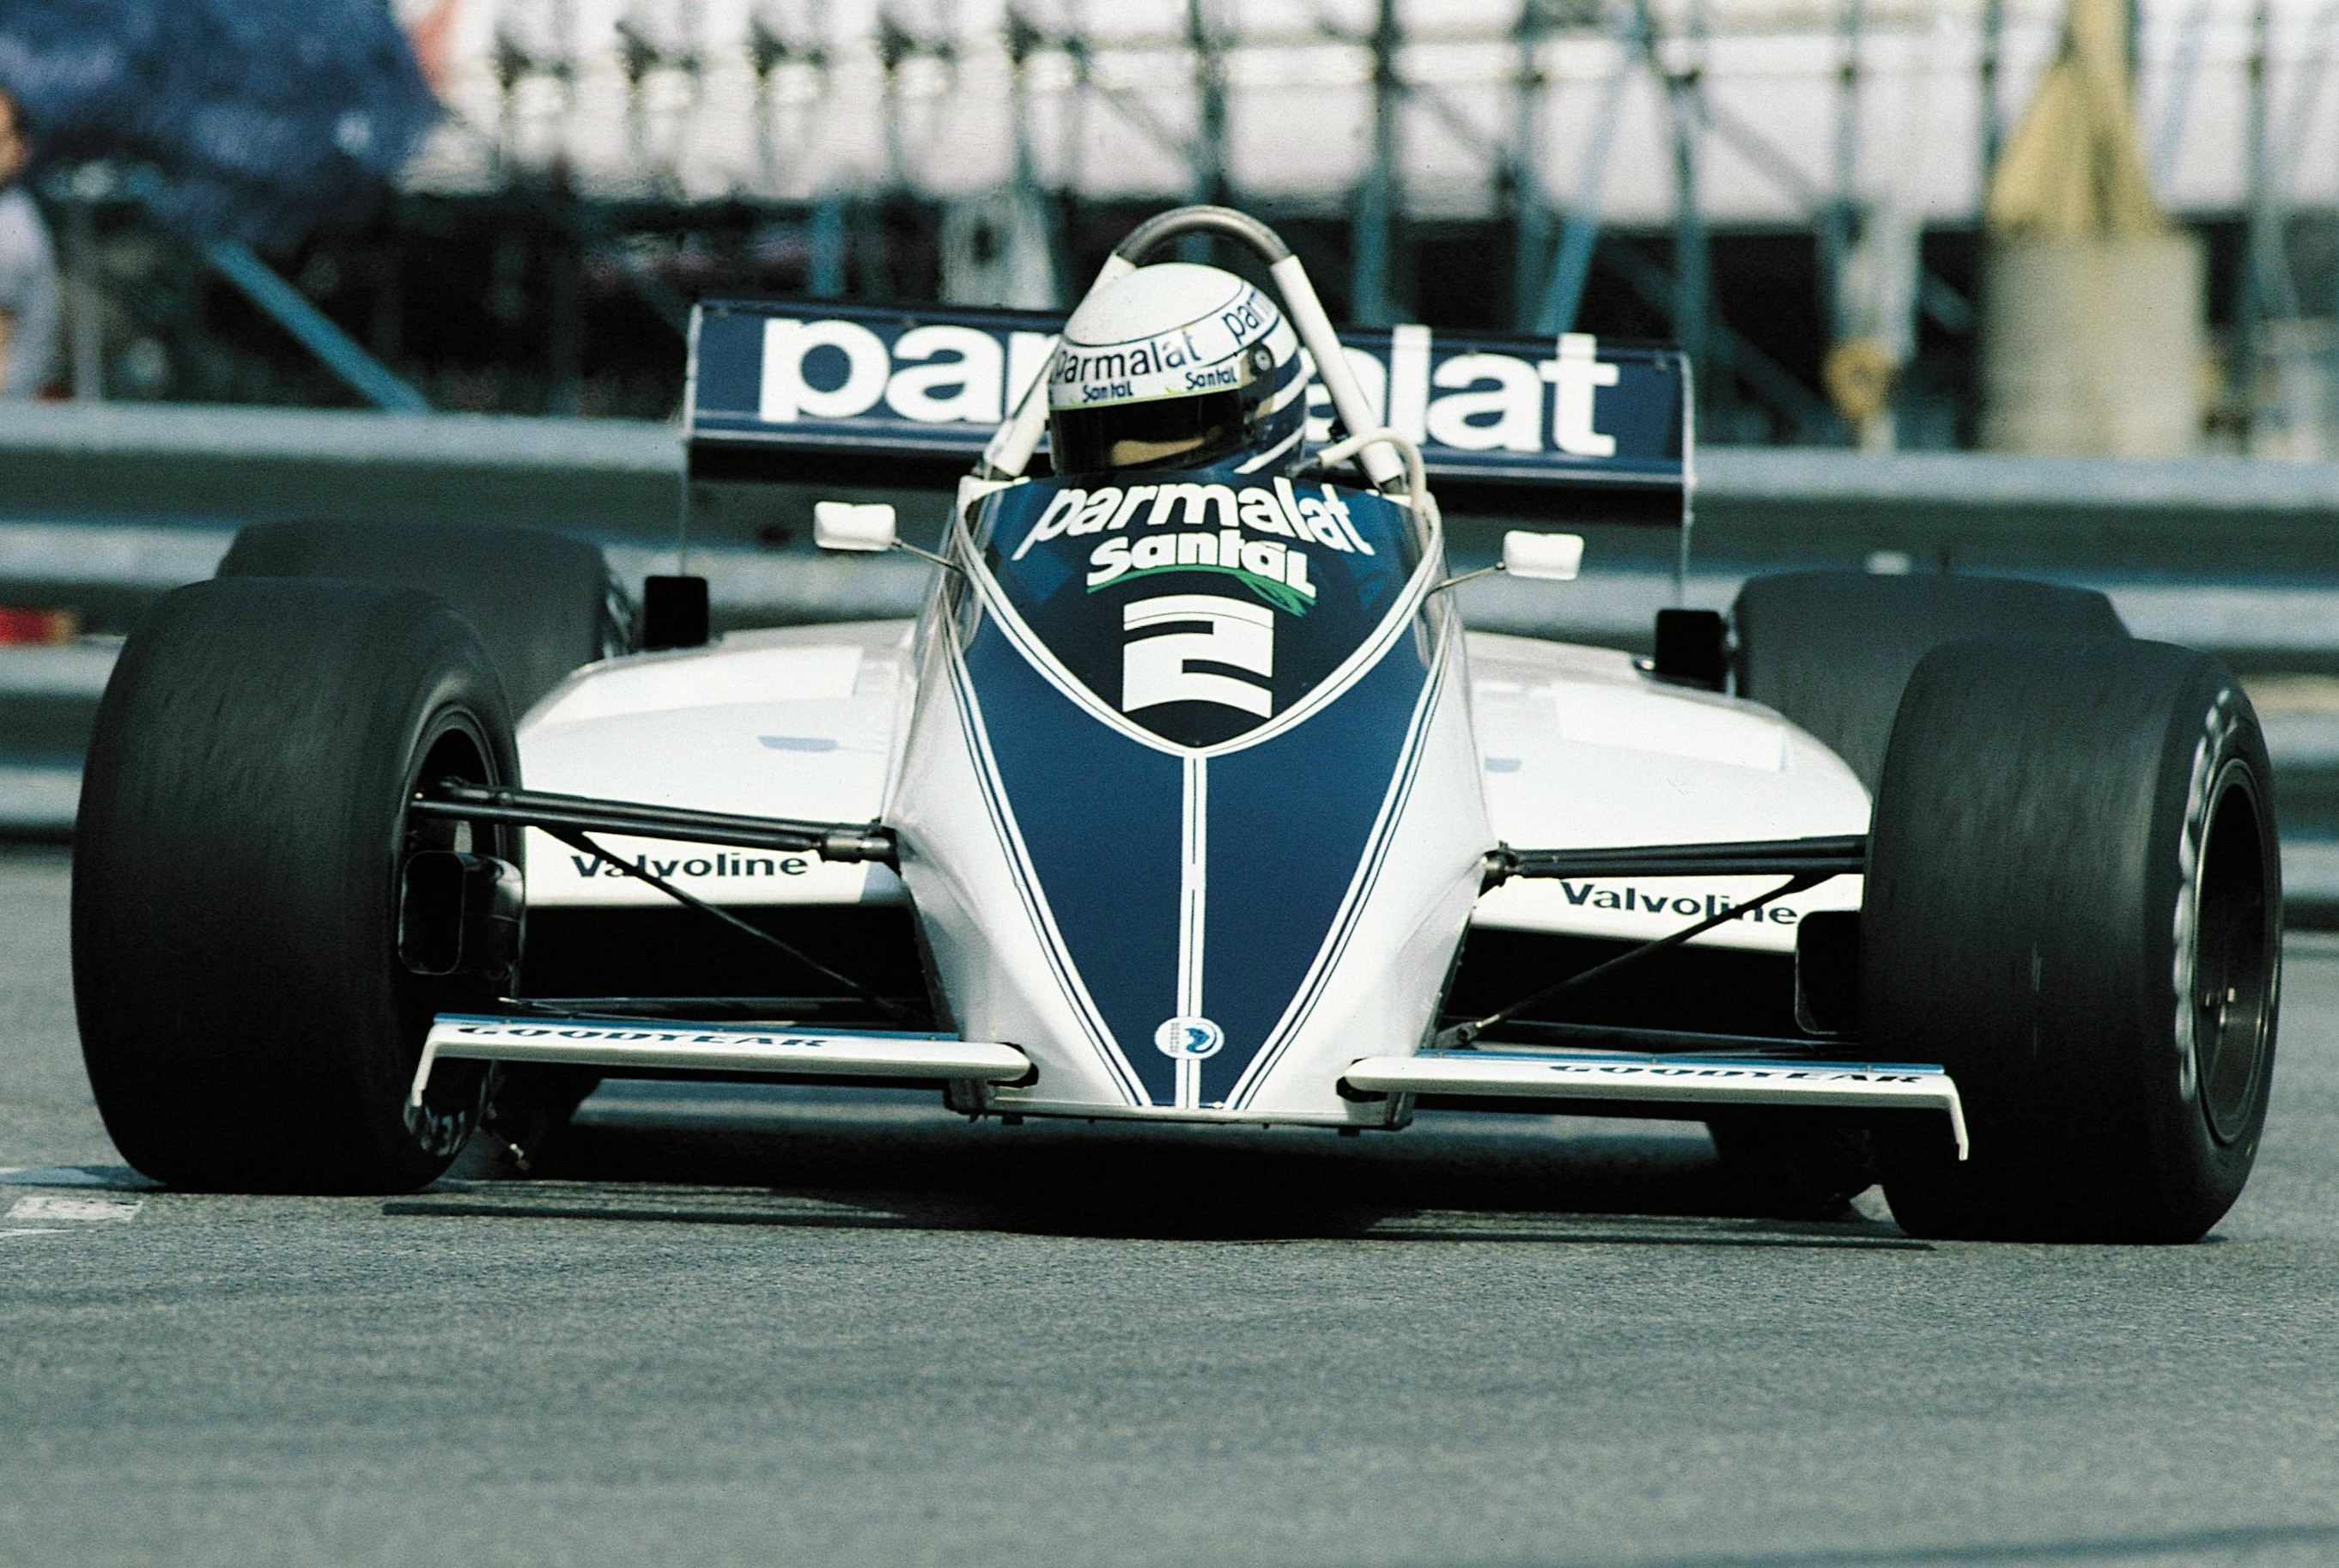 Riccardo Patrese (Brabham) - 1982 Monaco GP